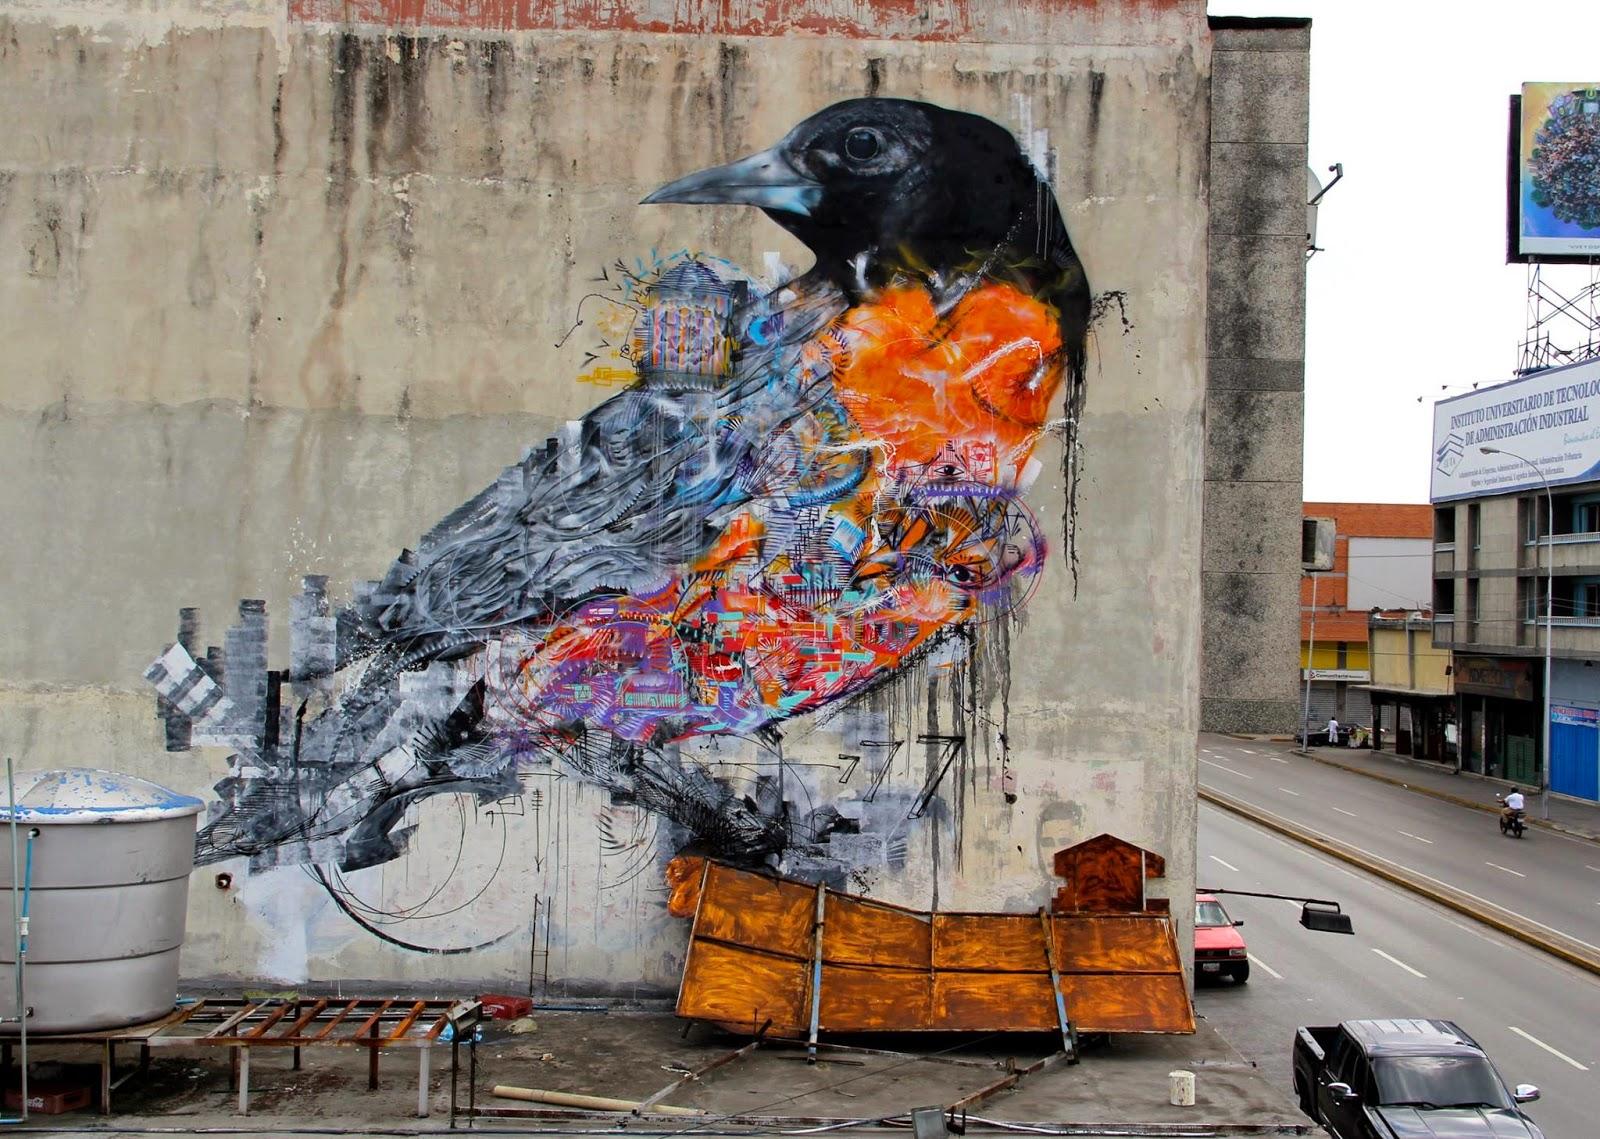 L7m Unveils A New Street Art Mural In Maracay Venezuela